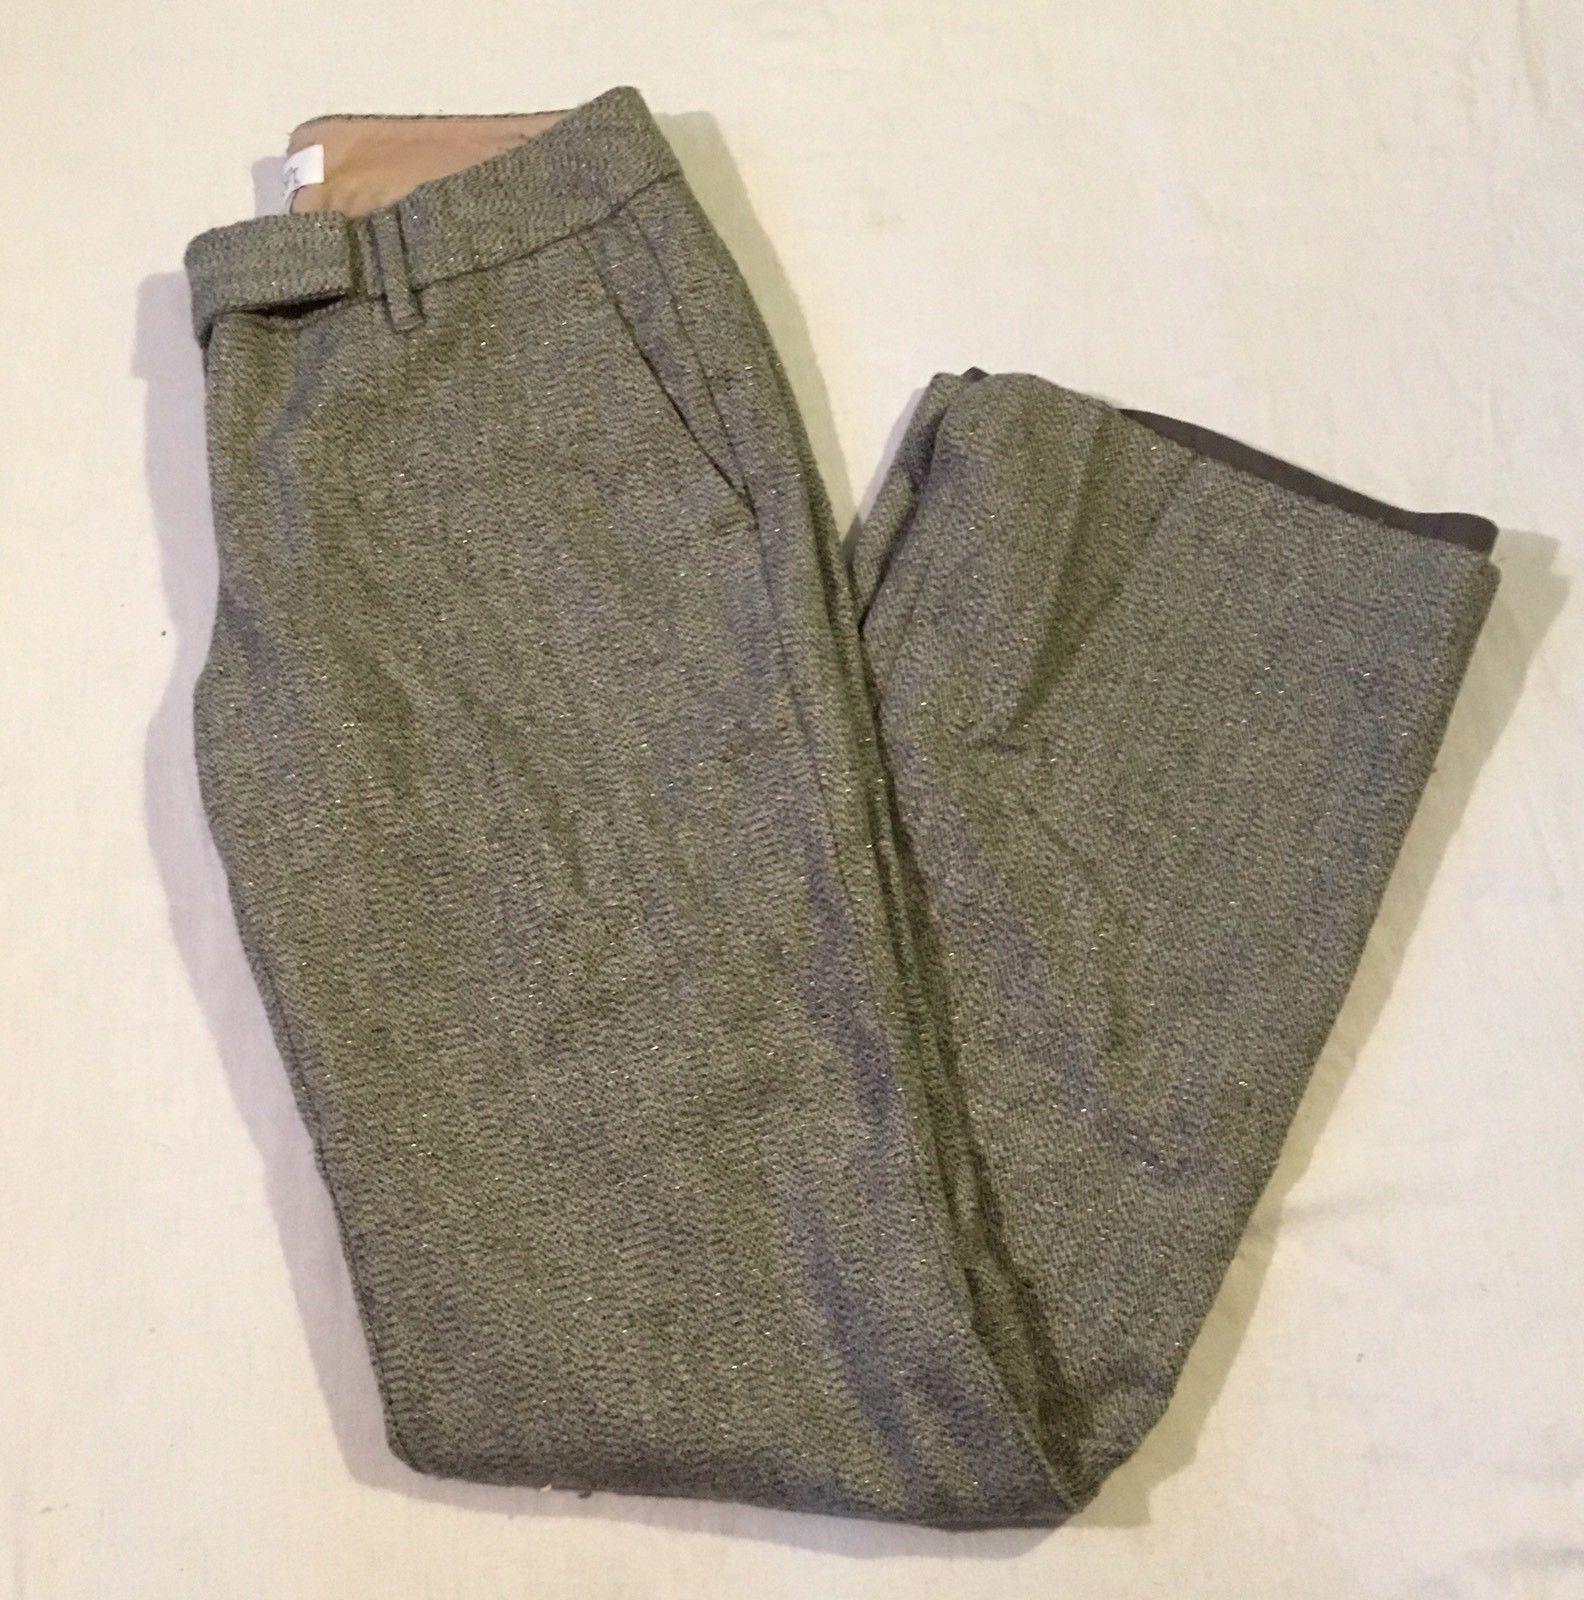 cc7b5c9c45b Ann Taylor Loft Size 2 Pants Marisa Gray and 50 similar items